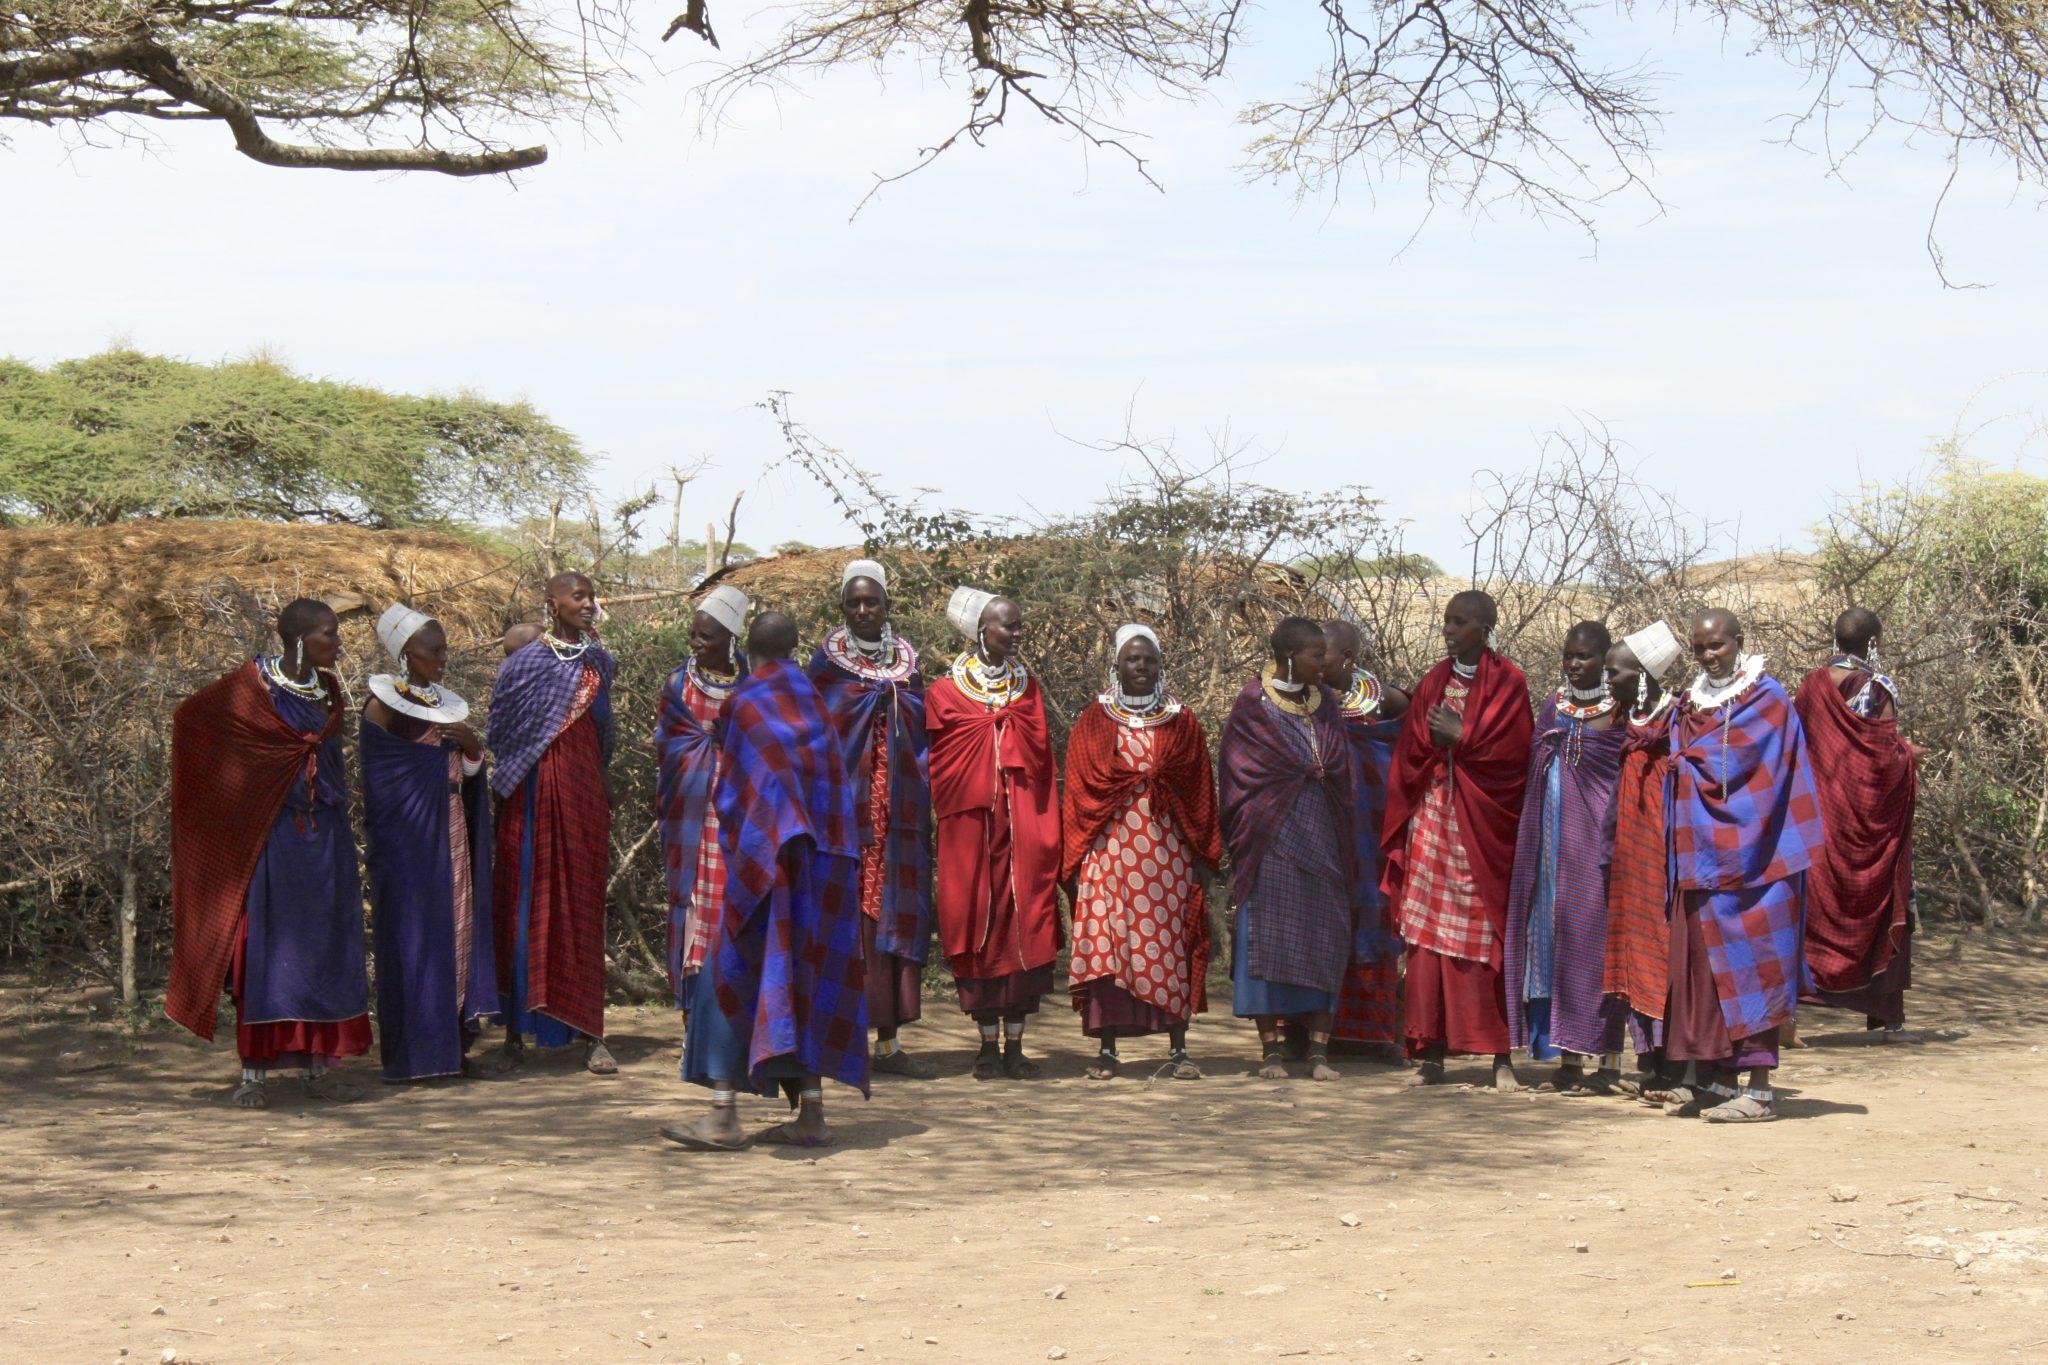 safari, Tanzania, africa, serengeti, masai, tribe, village